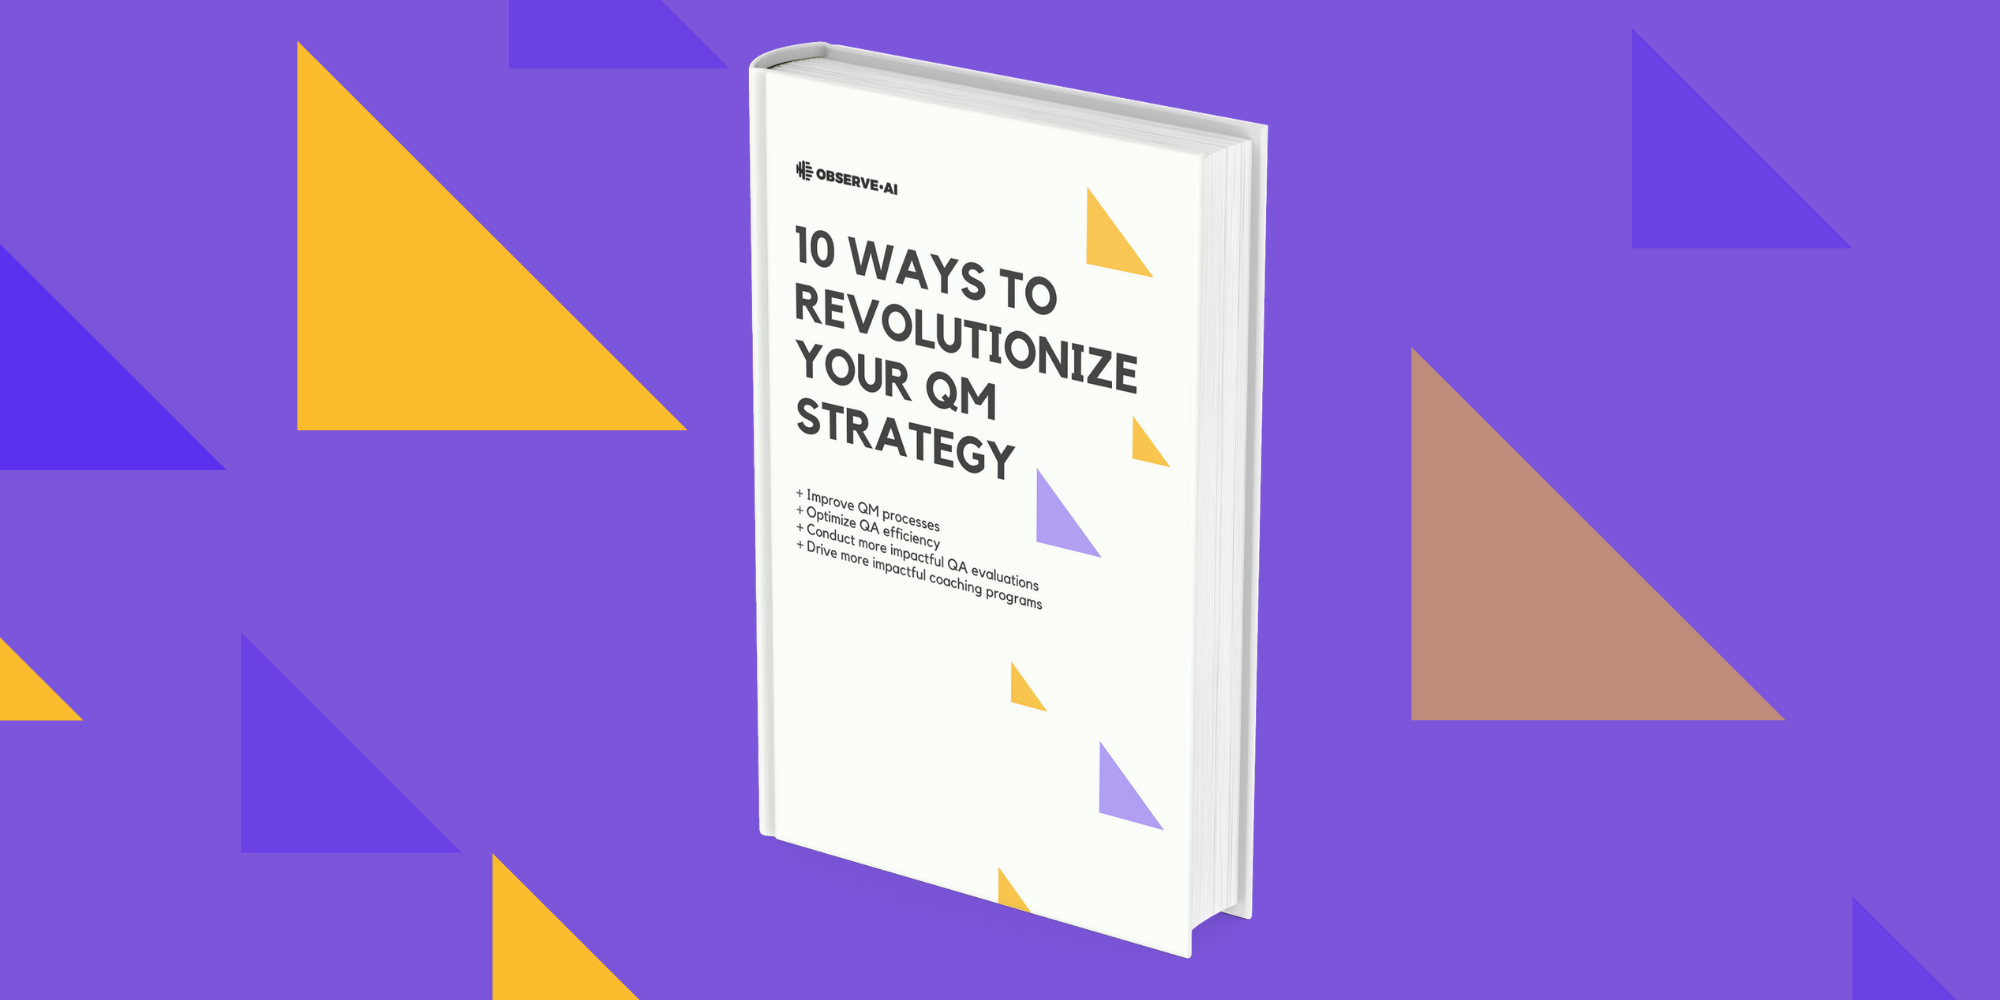 10 Ways to Revolutionize Your Quality Management Strategy